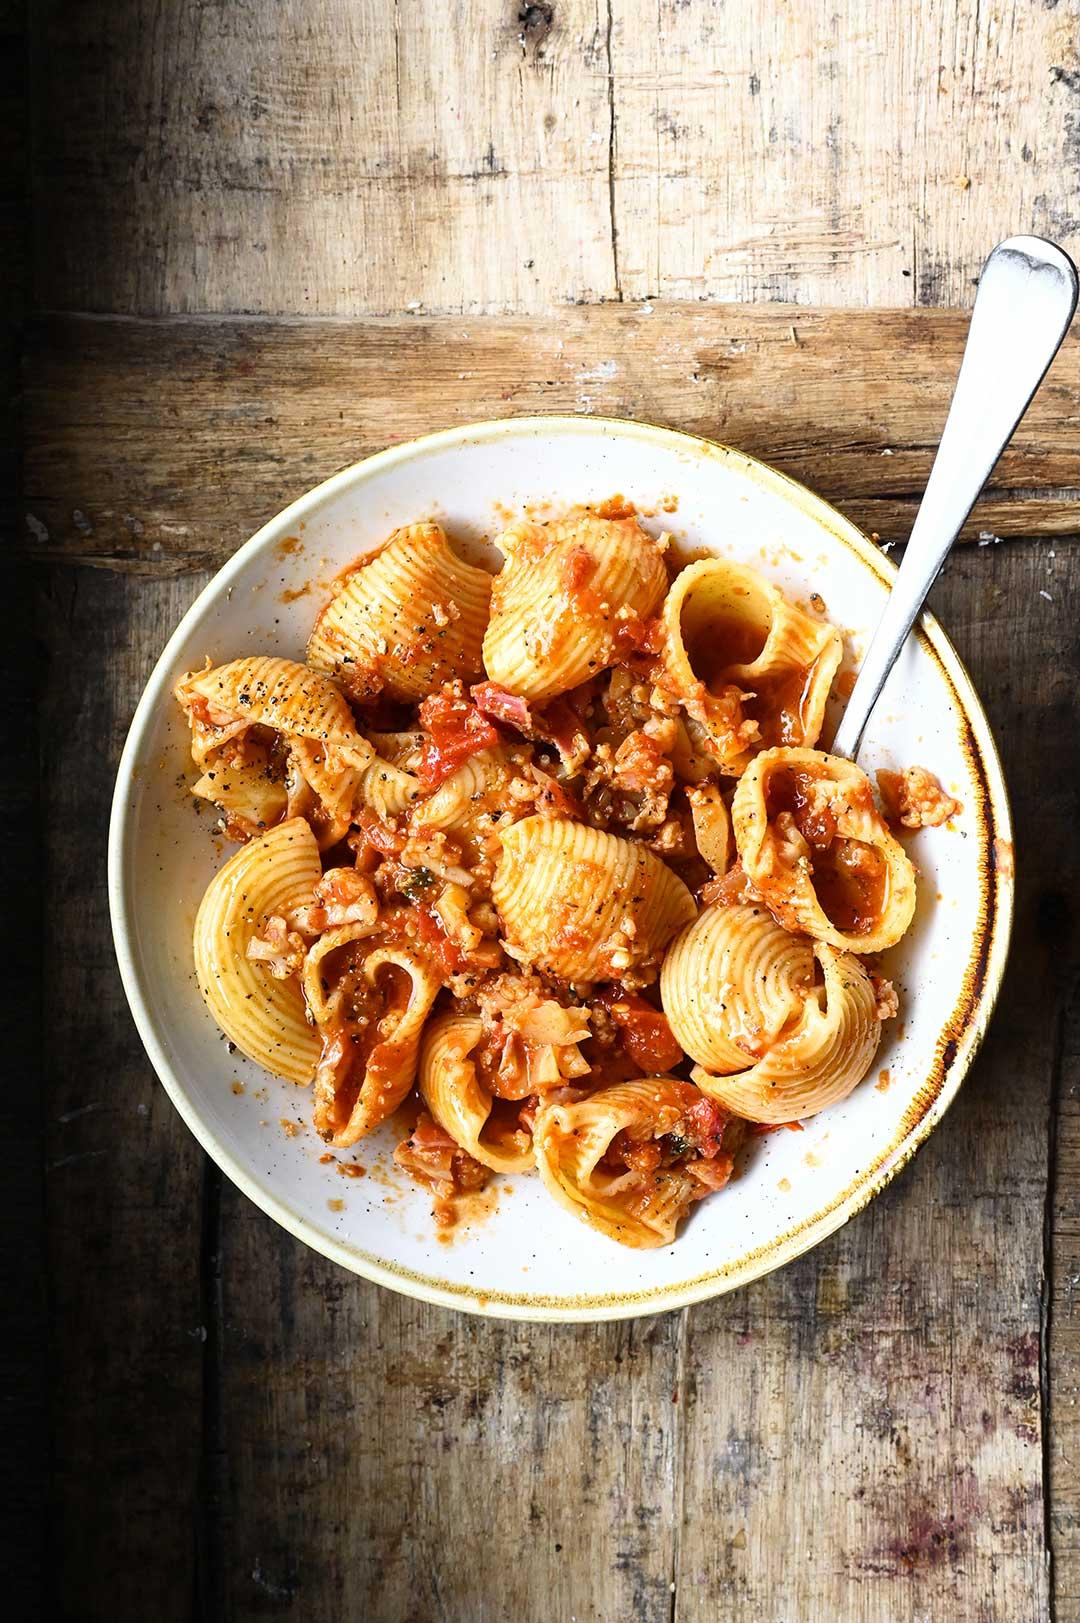 serving dumplings | Makaron z sosem bolońskim z kalafiorem i pancettą